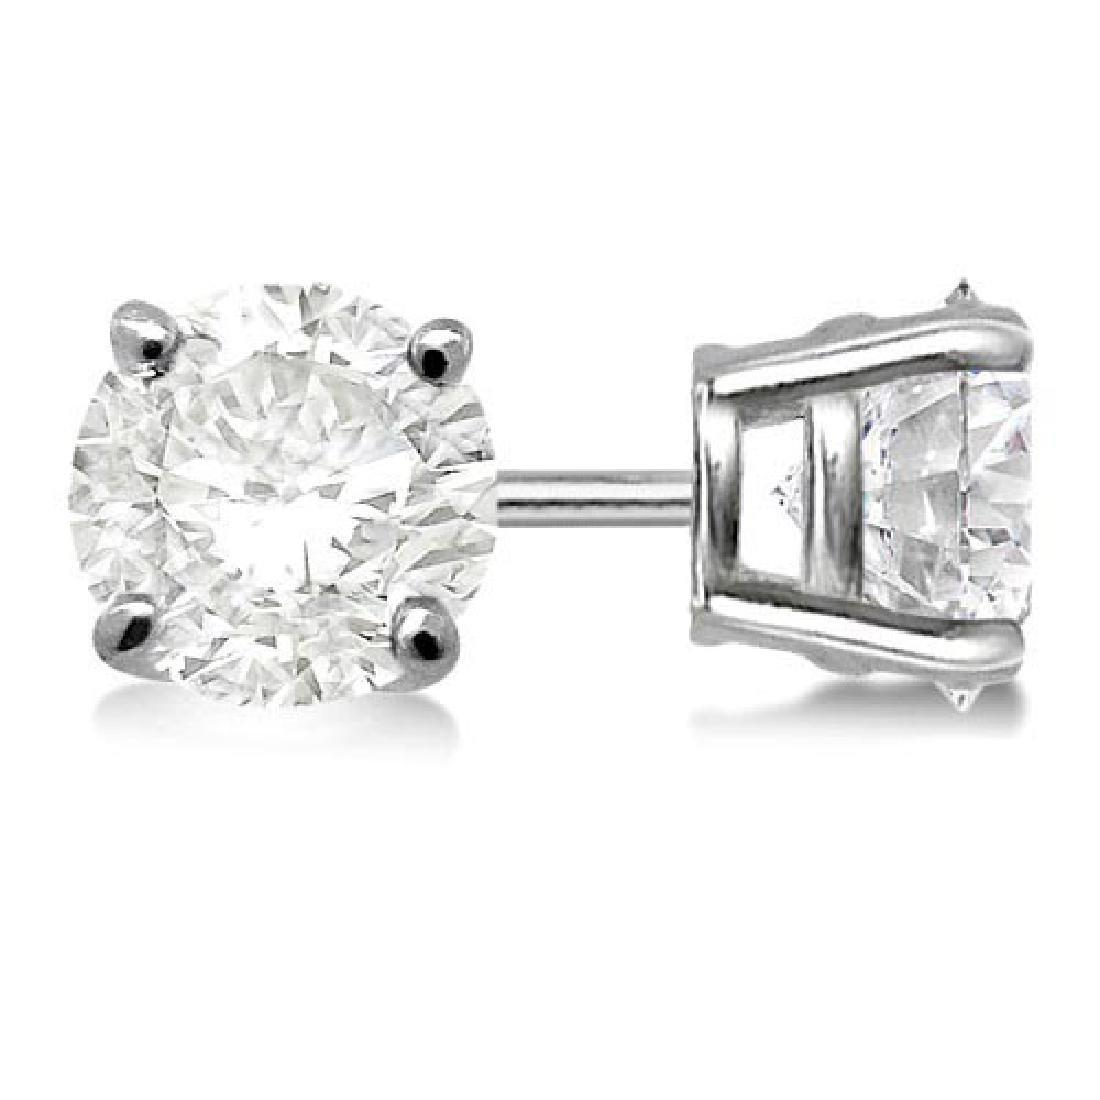 Certified 1.28 CTW Round Diamond Stud Earrings E/I1